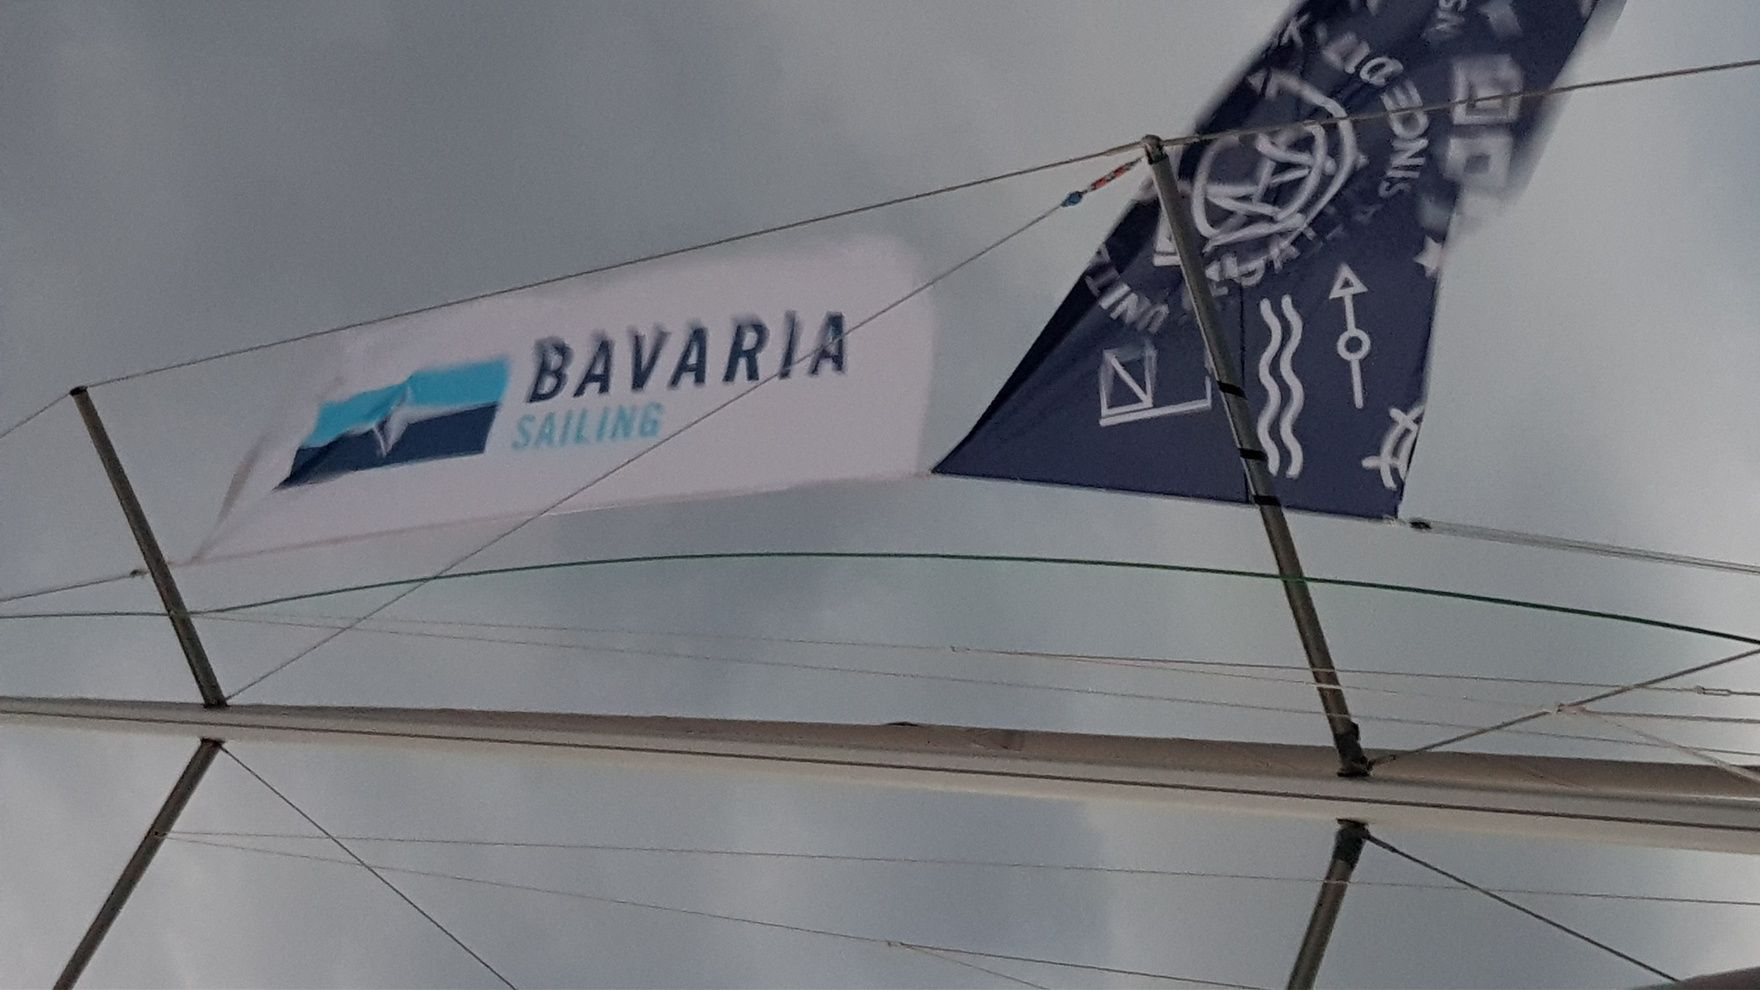 Bavaria Cup 2019